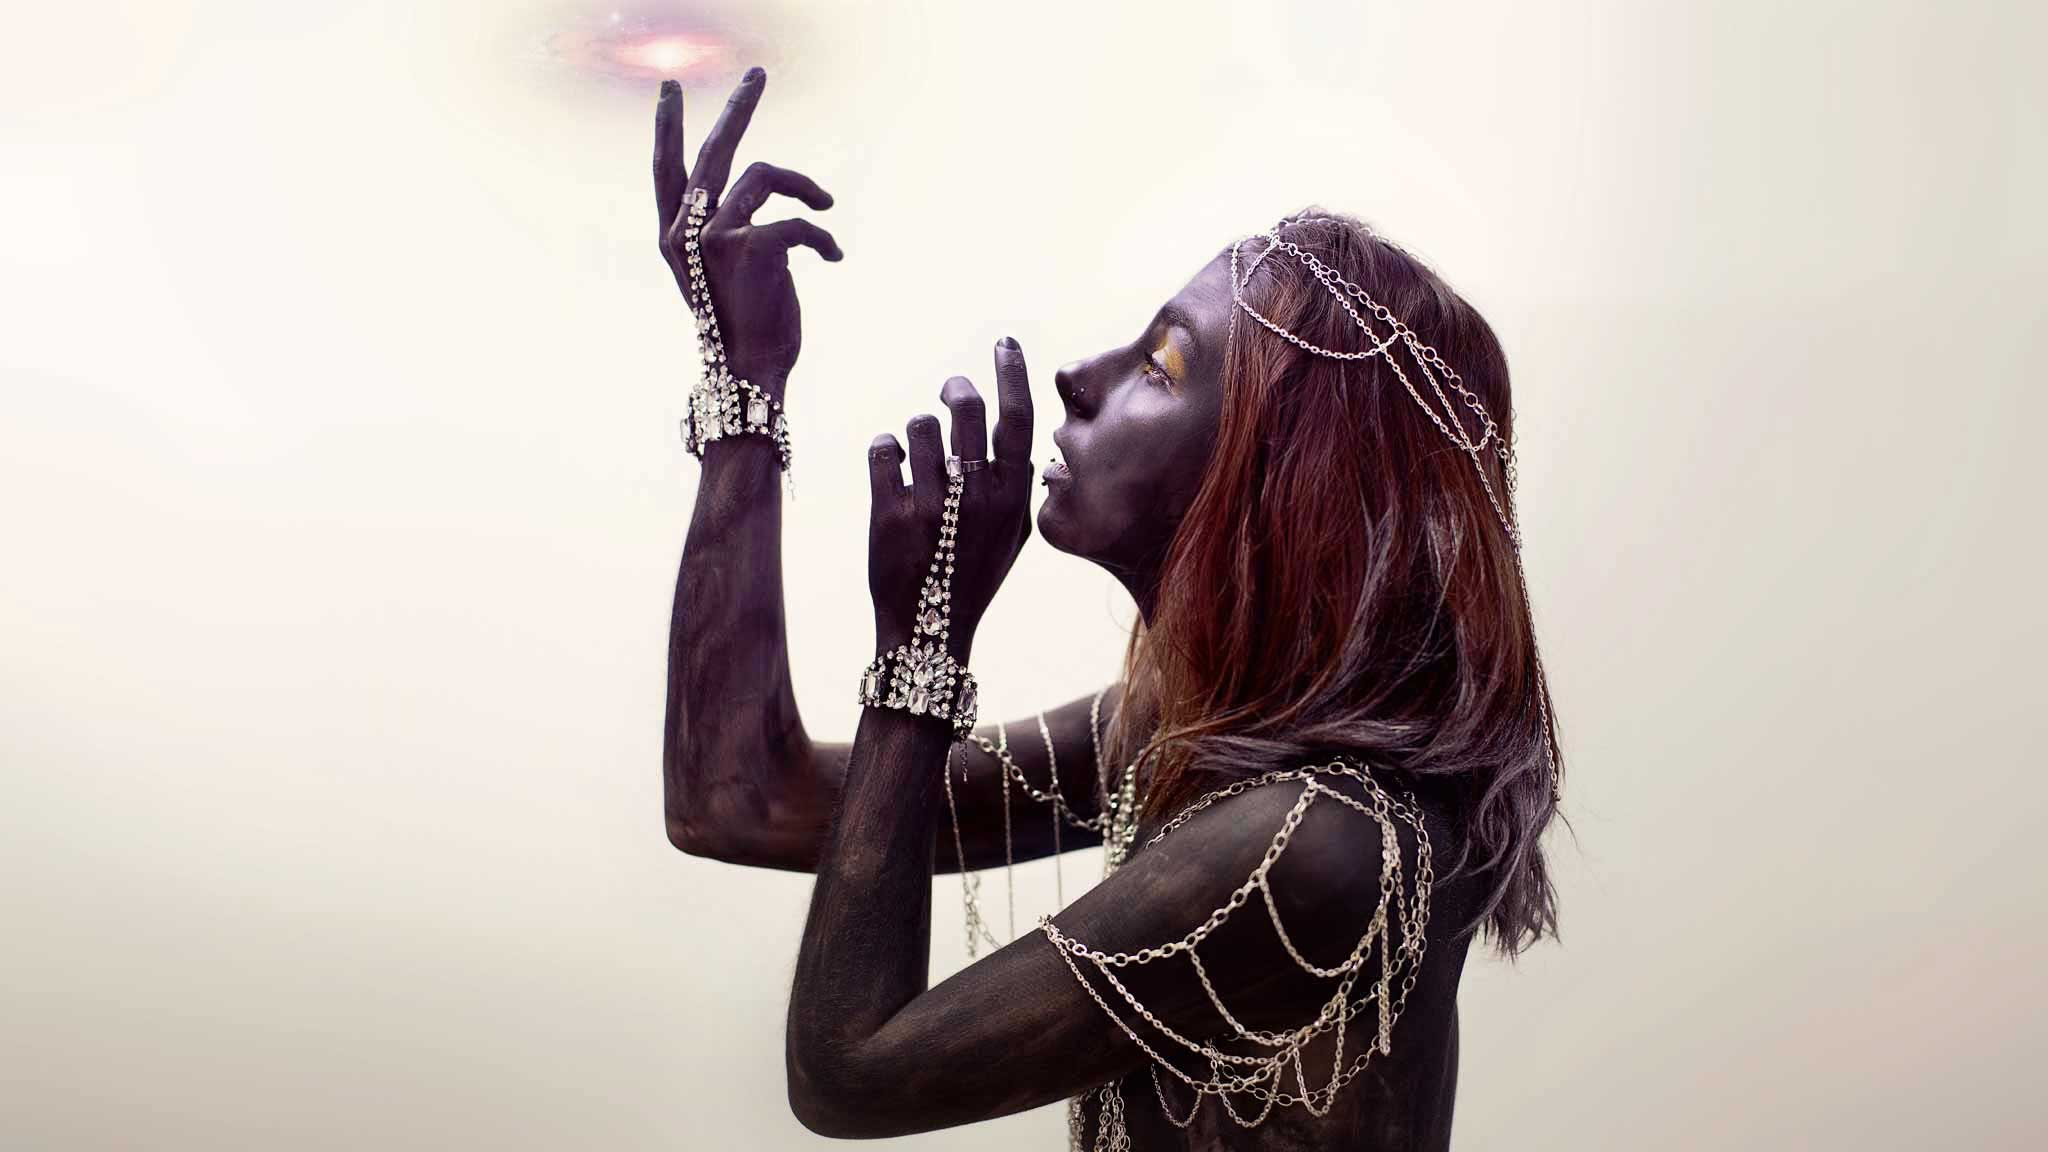 photographe portrait art black skin galaxy cosmos mystic sexy girl